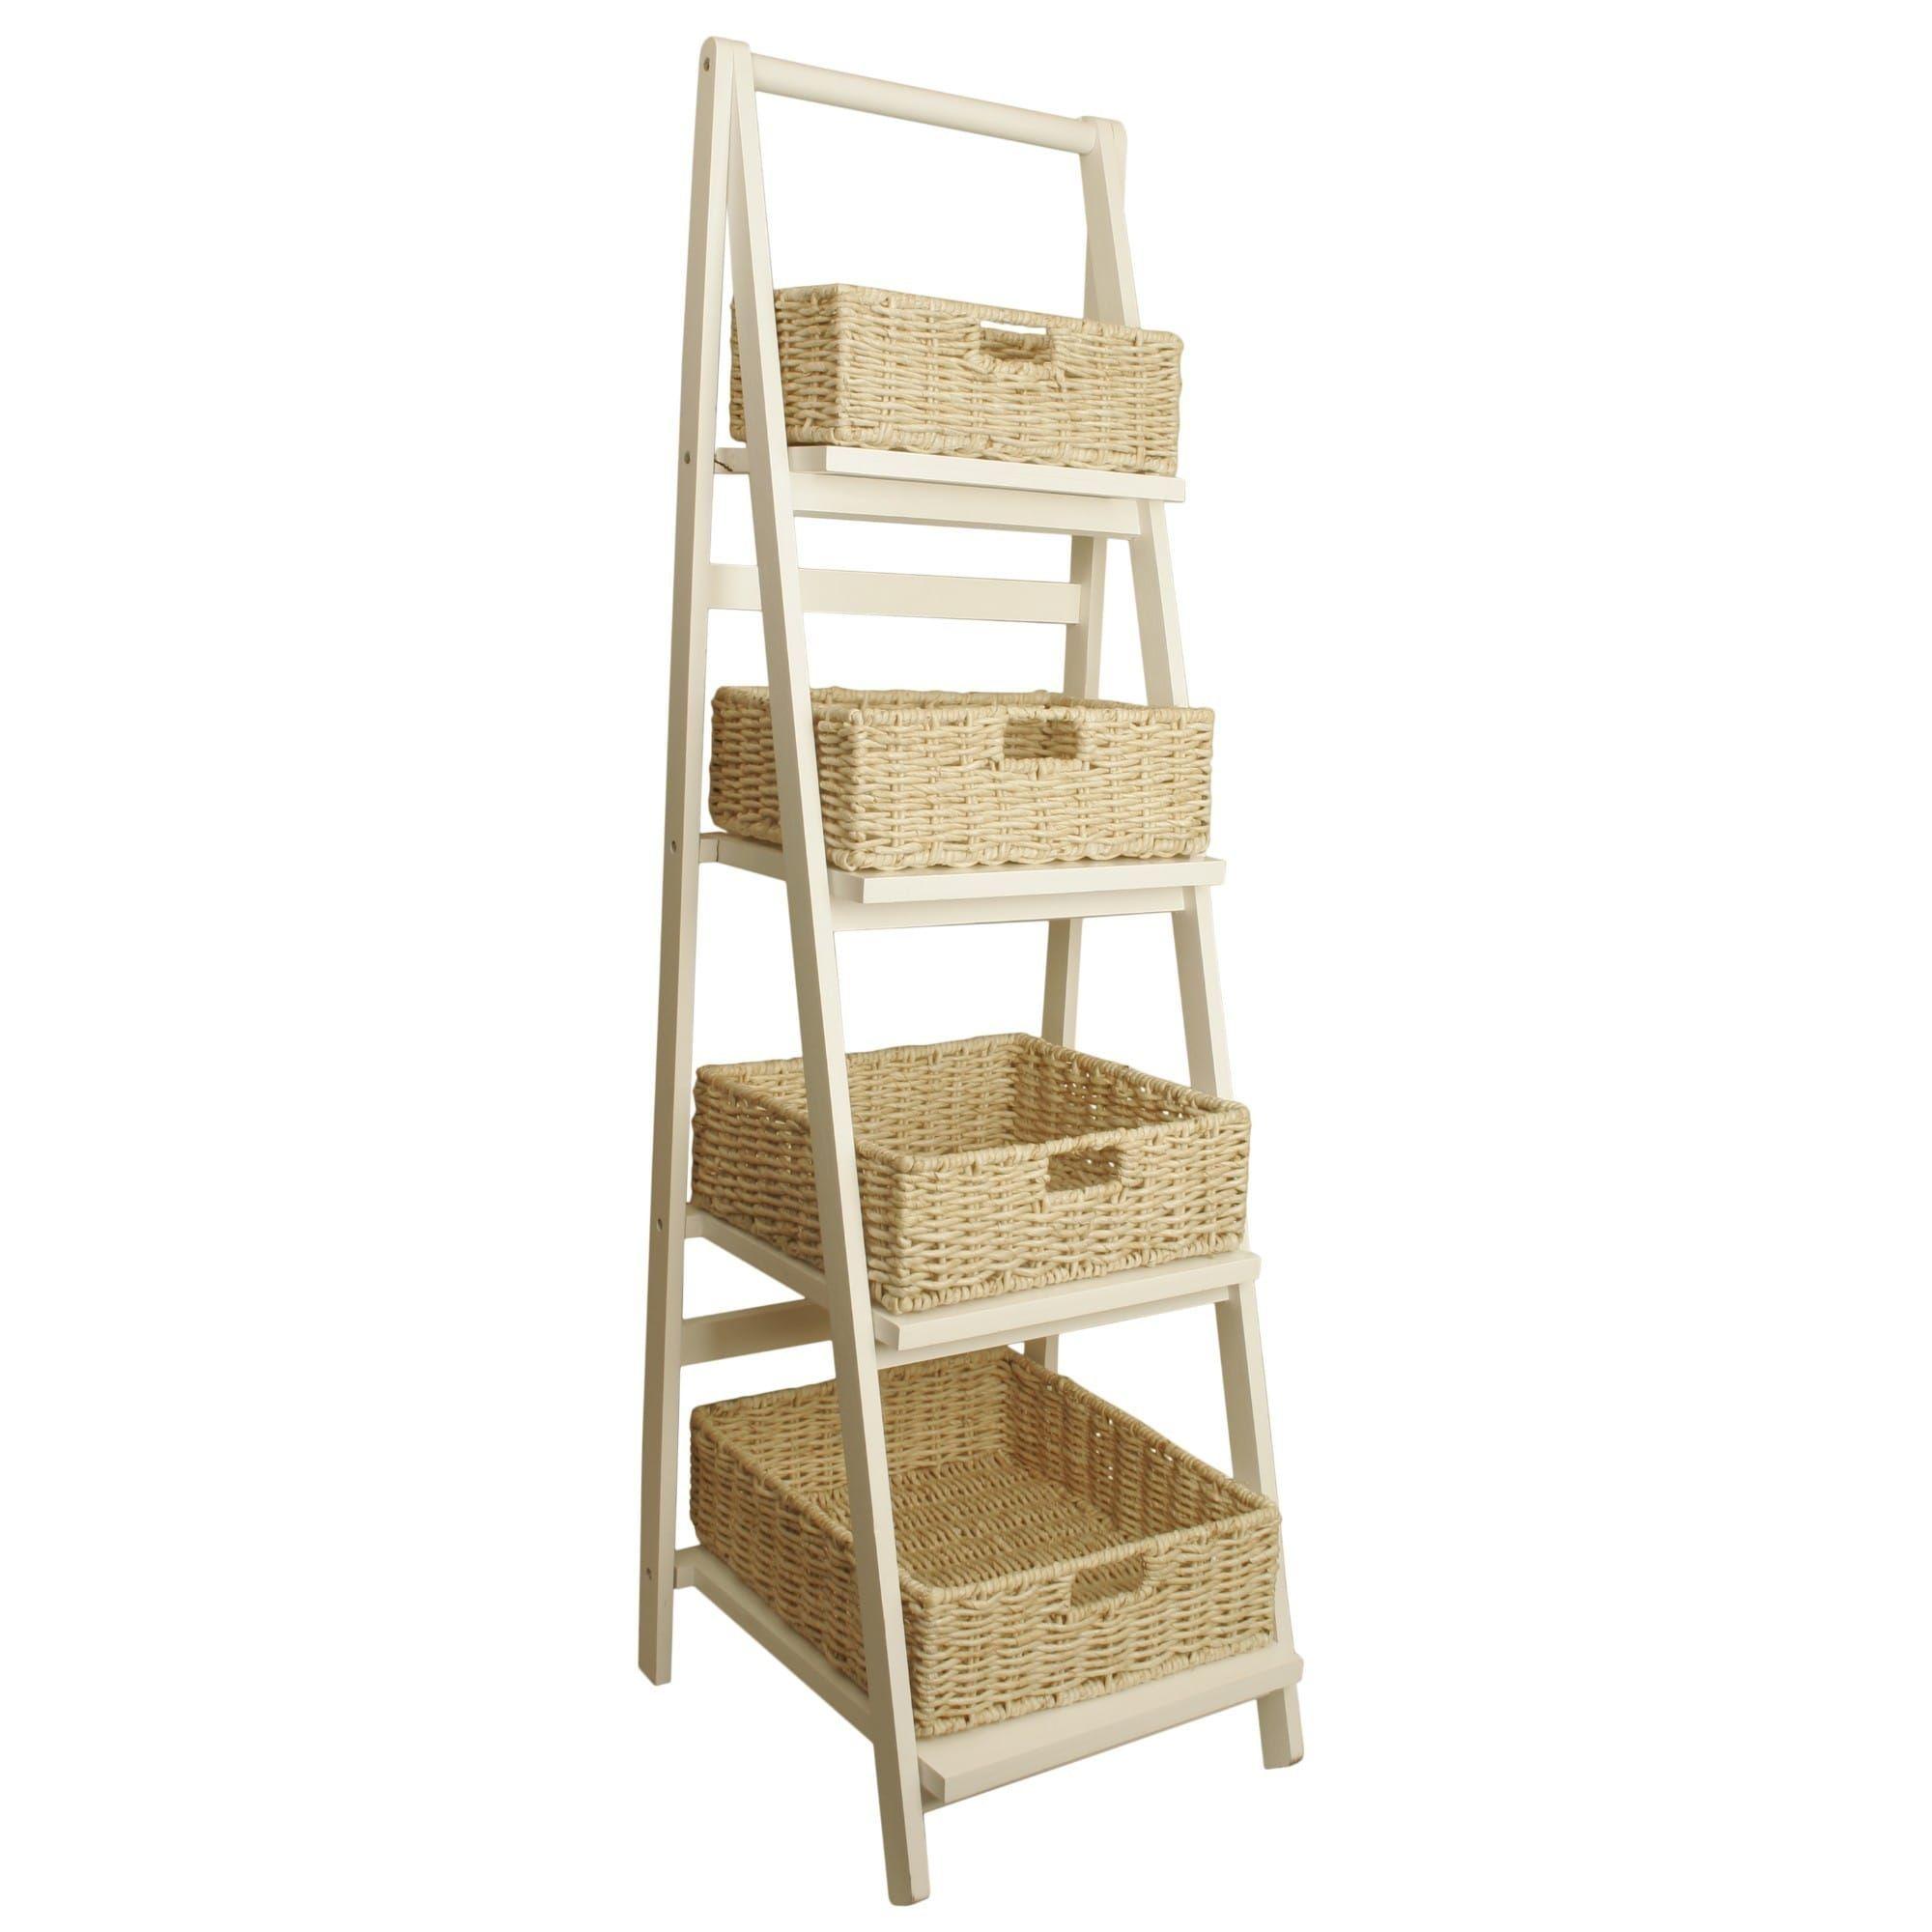 Online Shopping Bedding Furniture Electronics Jewelry Clothing More Blanket Ladder Storage Baskets Furniture